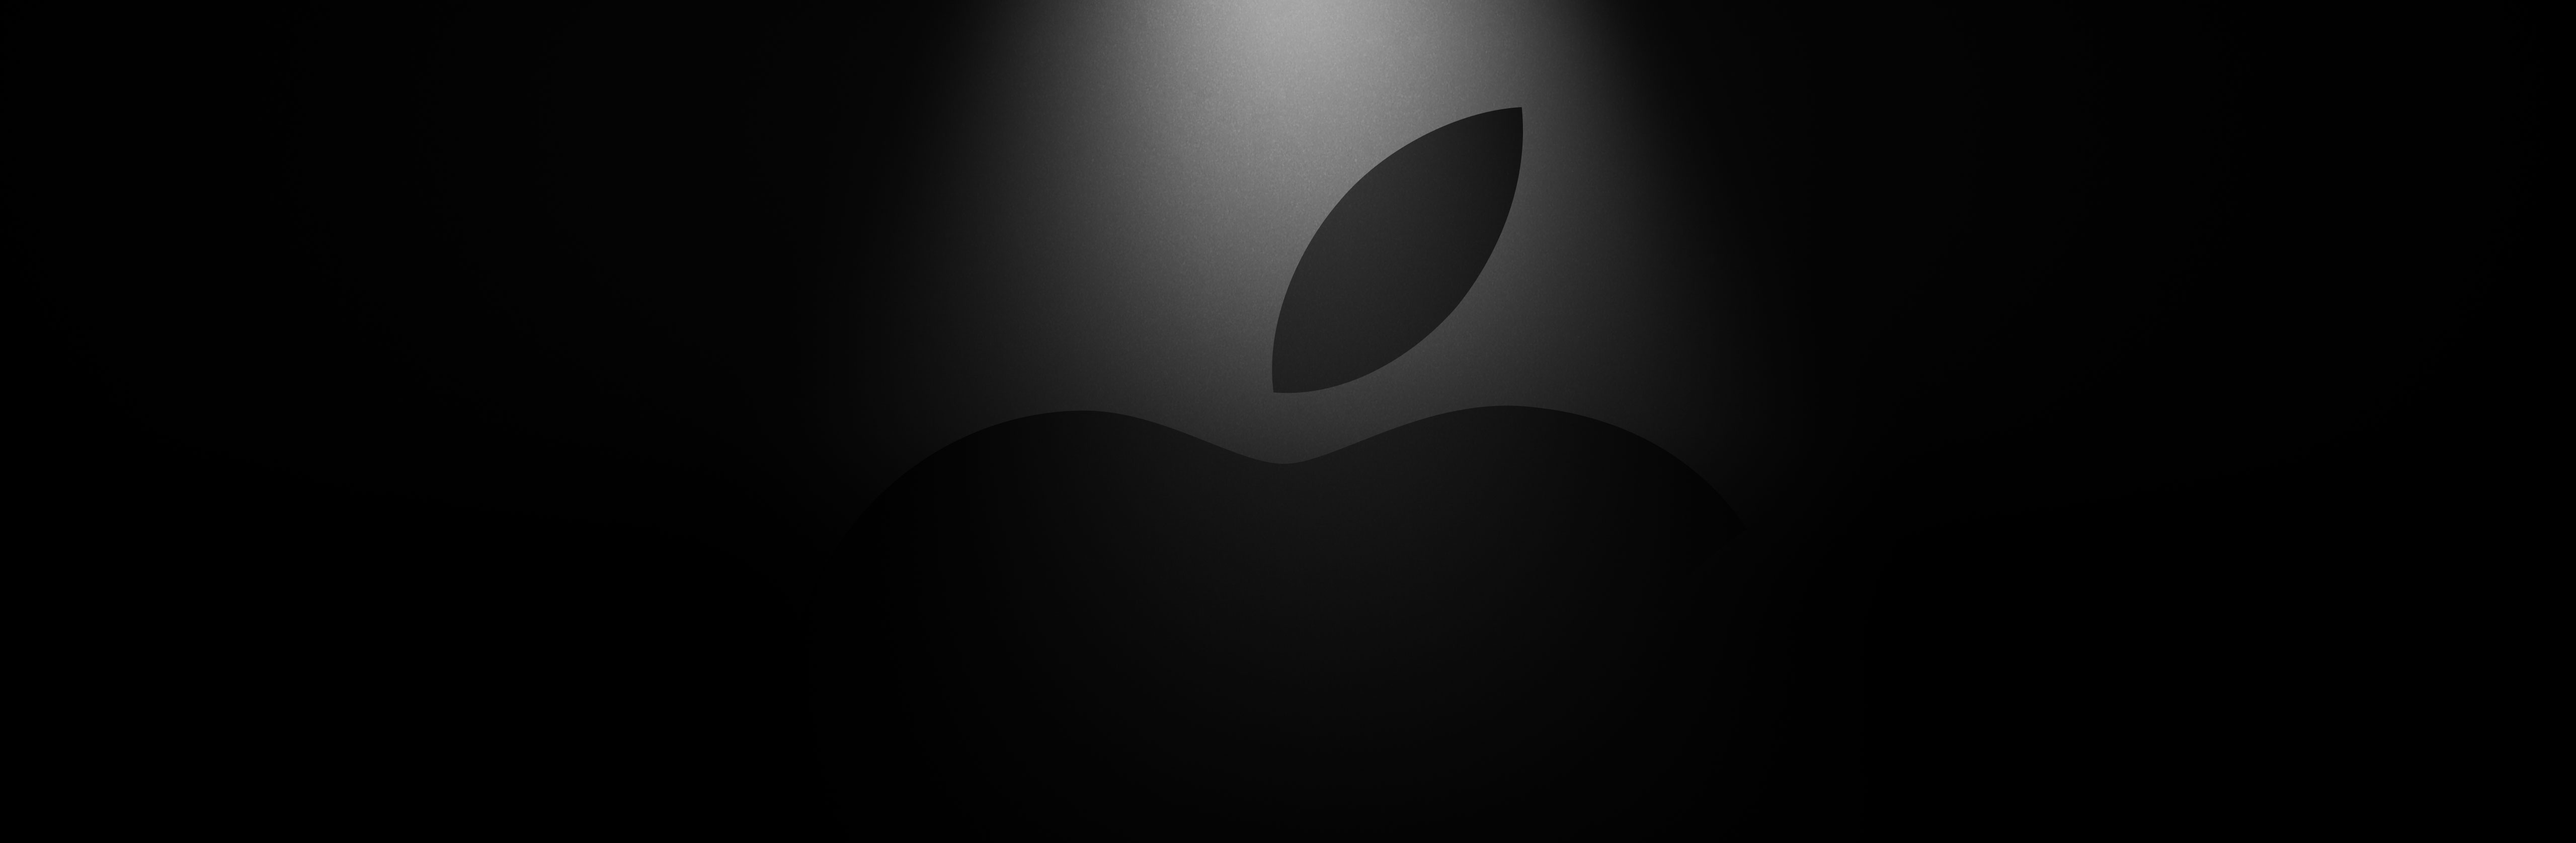 Apple、3月25日にスペシャルイベント開催を告知